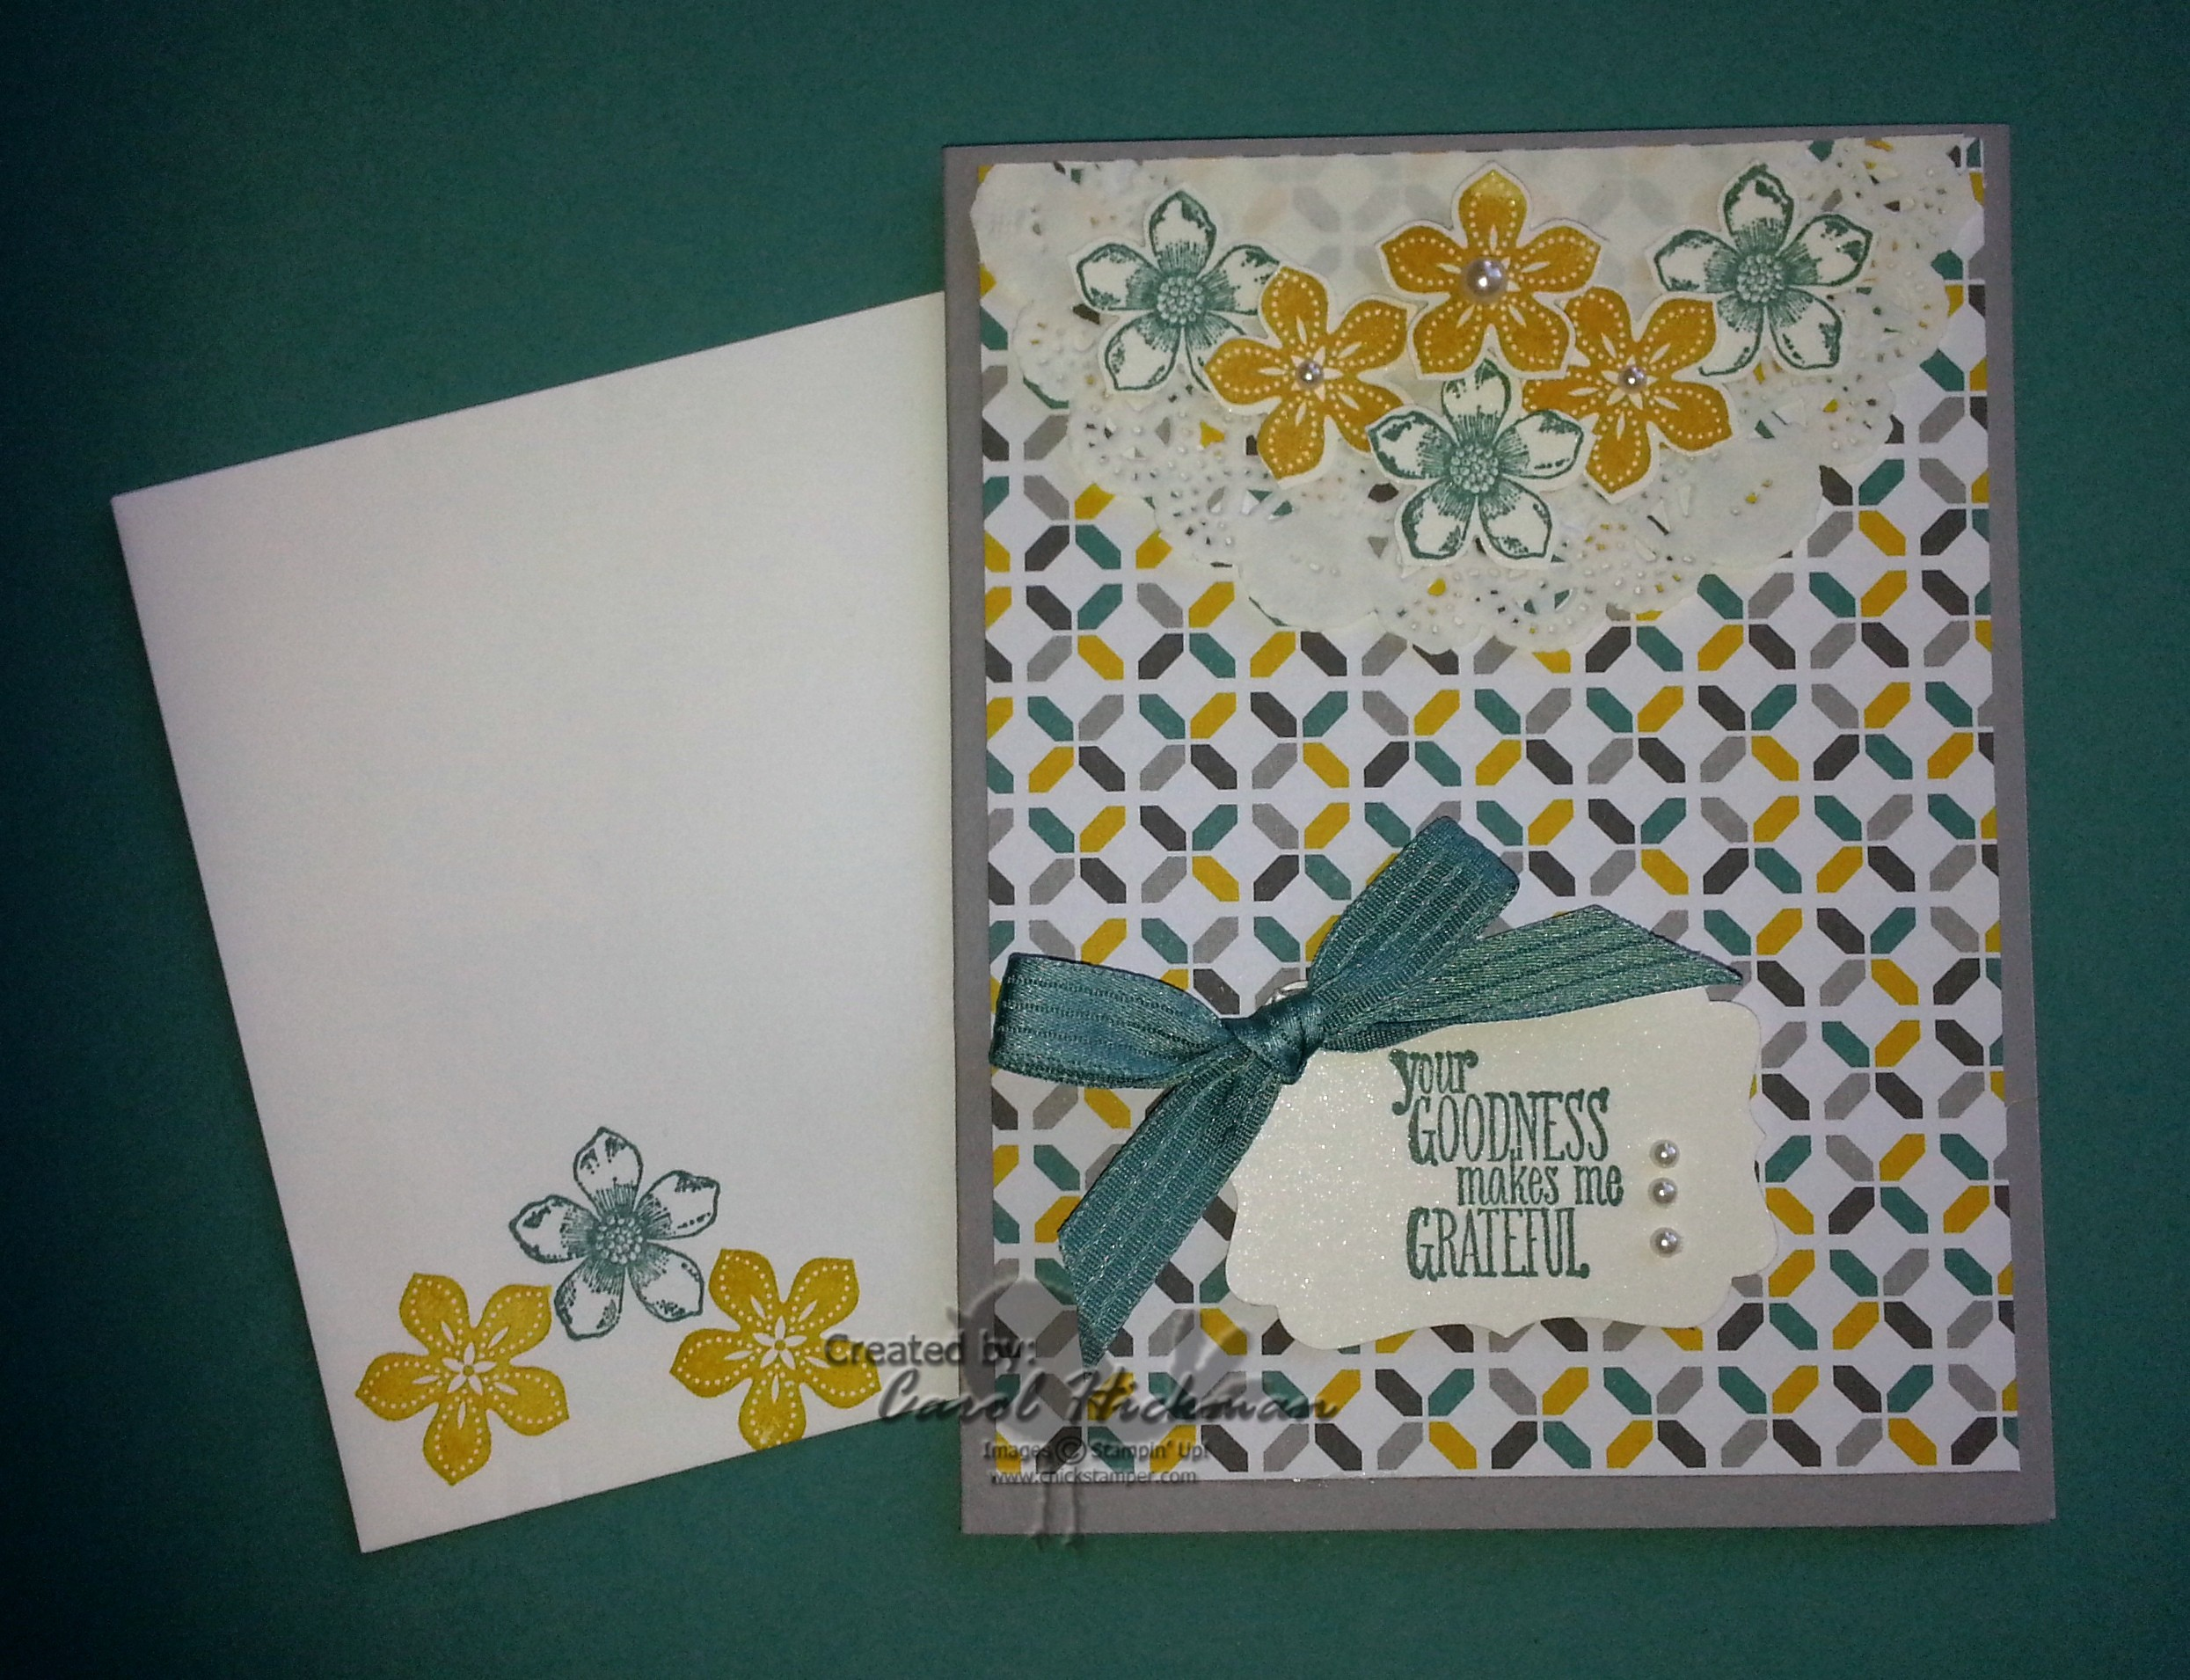 stampin up chickstamper petite petals something to say card